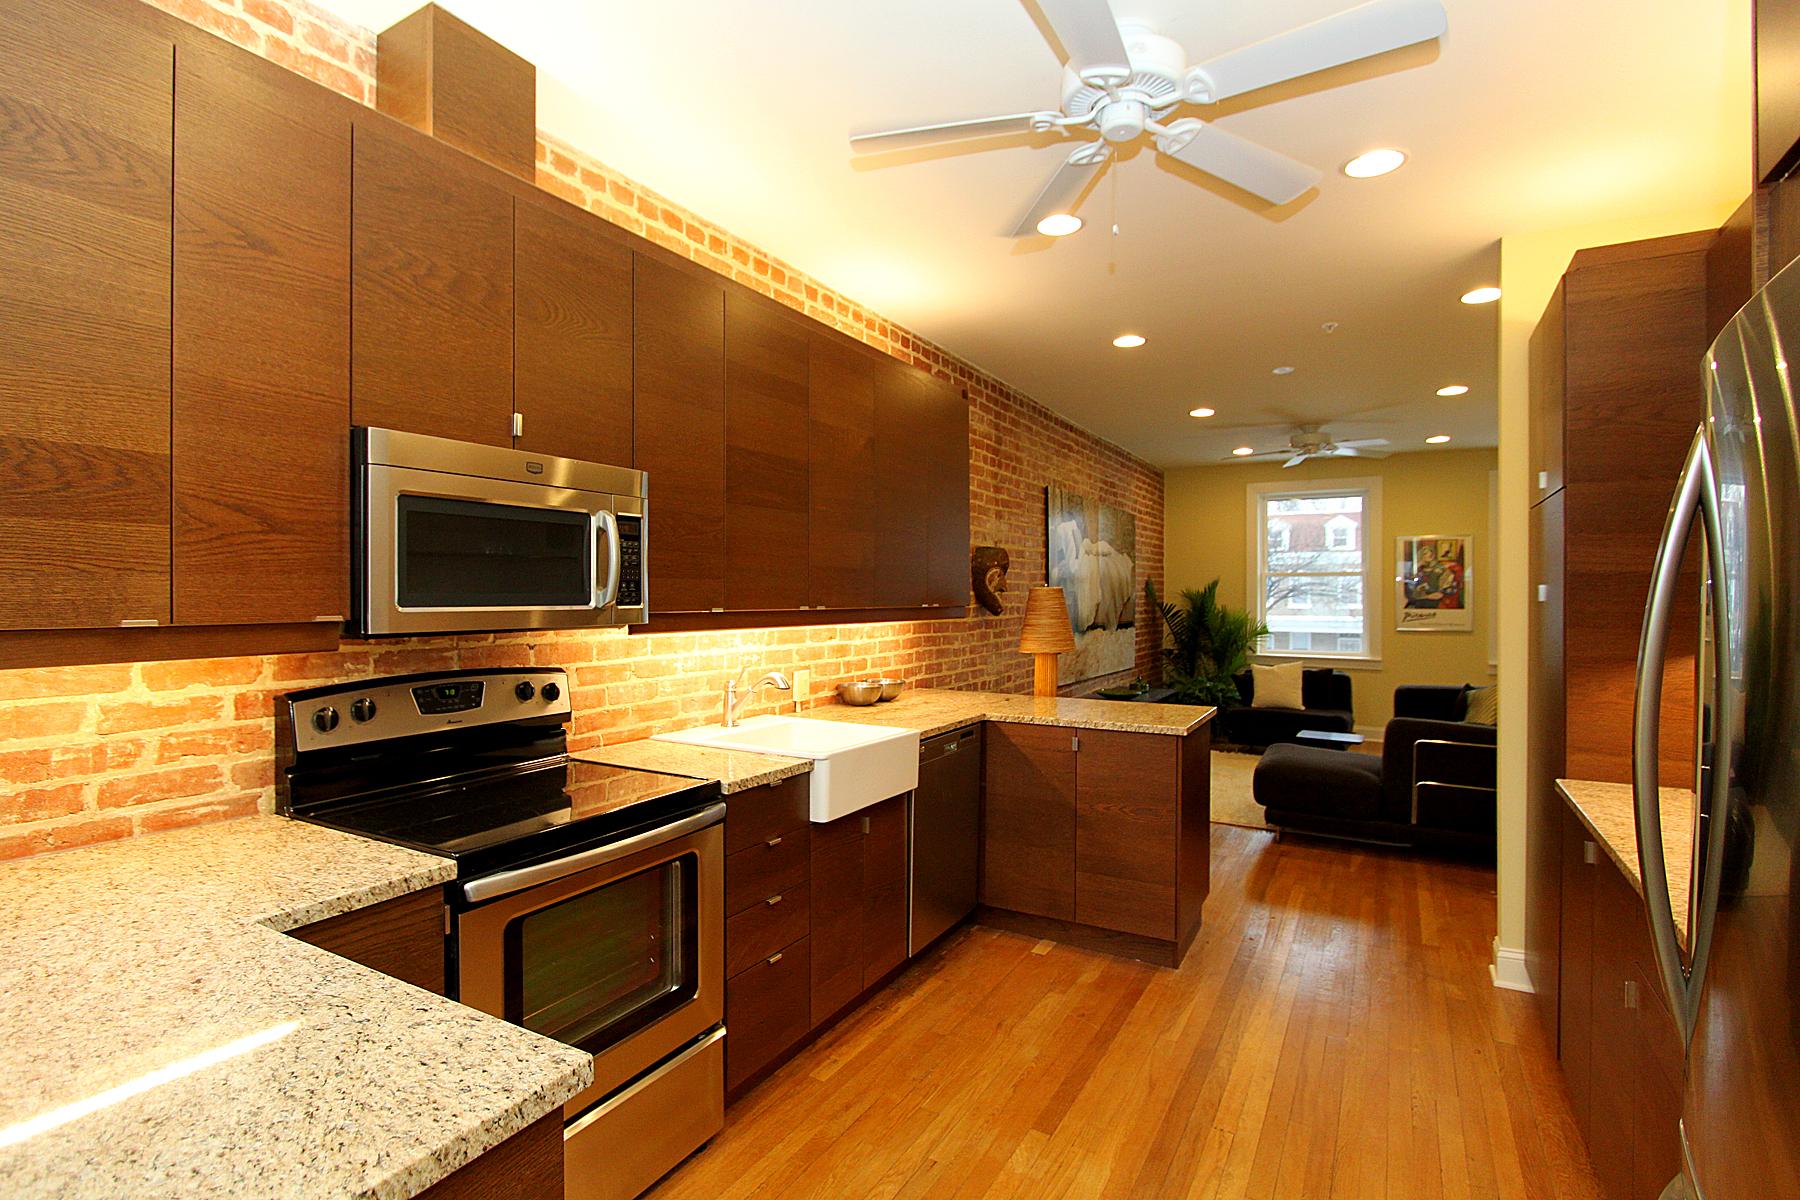 Oak plank floors are common